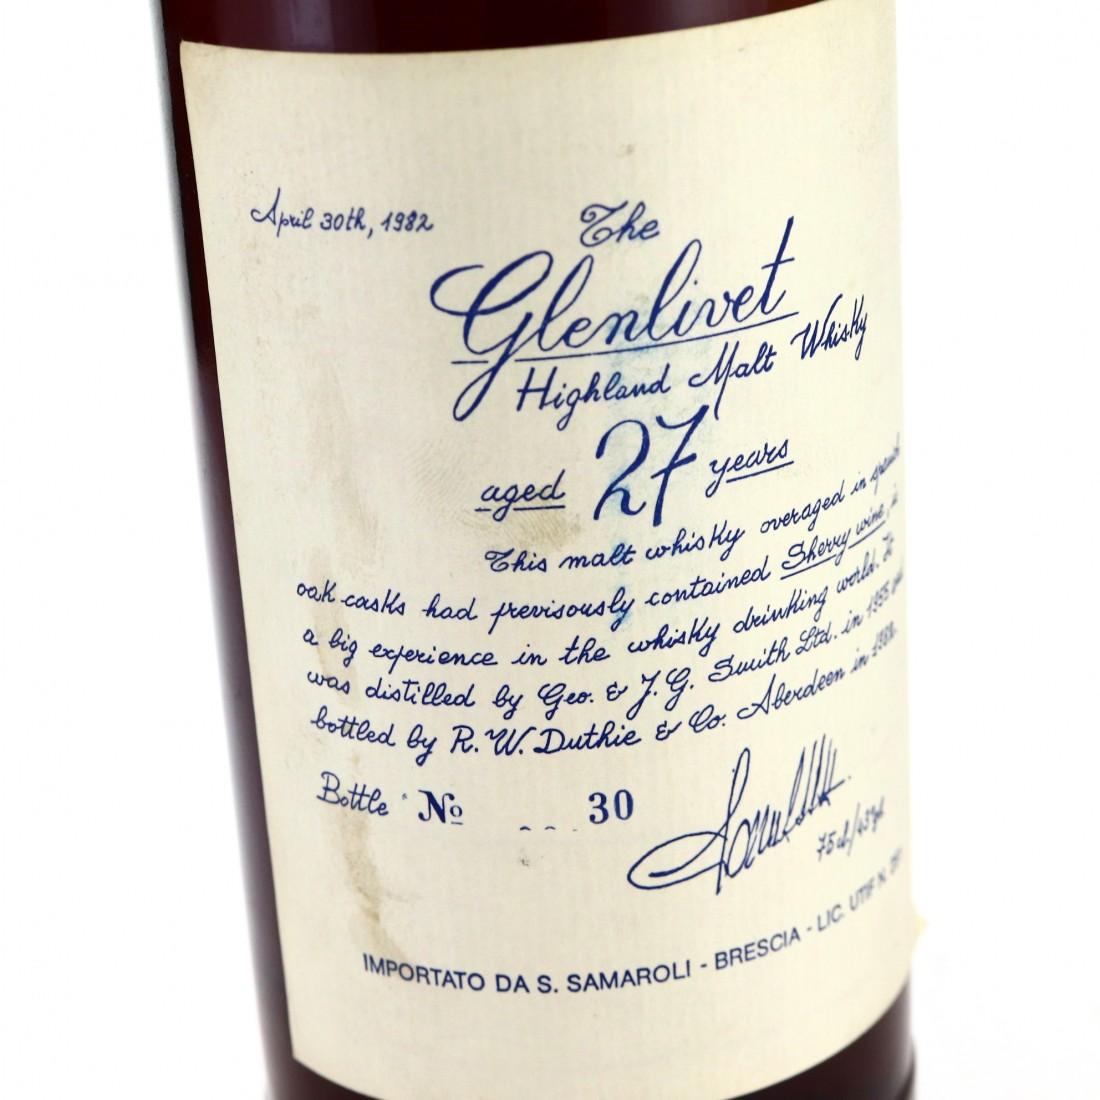 Glenlivet 1955 Samaroli / Handwritten Labels